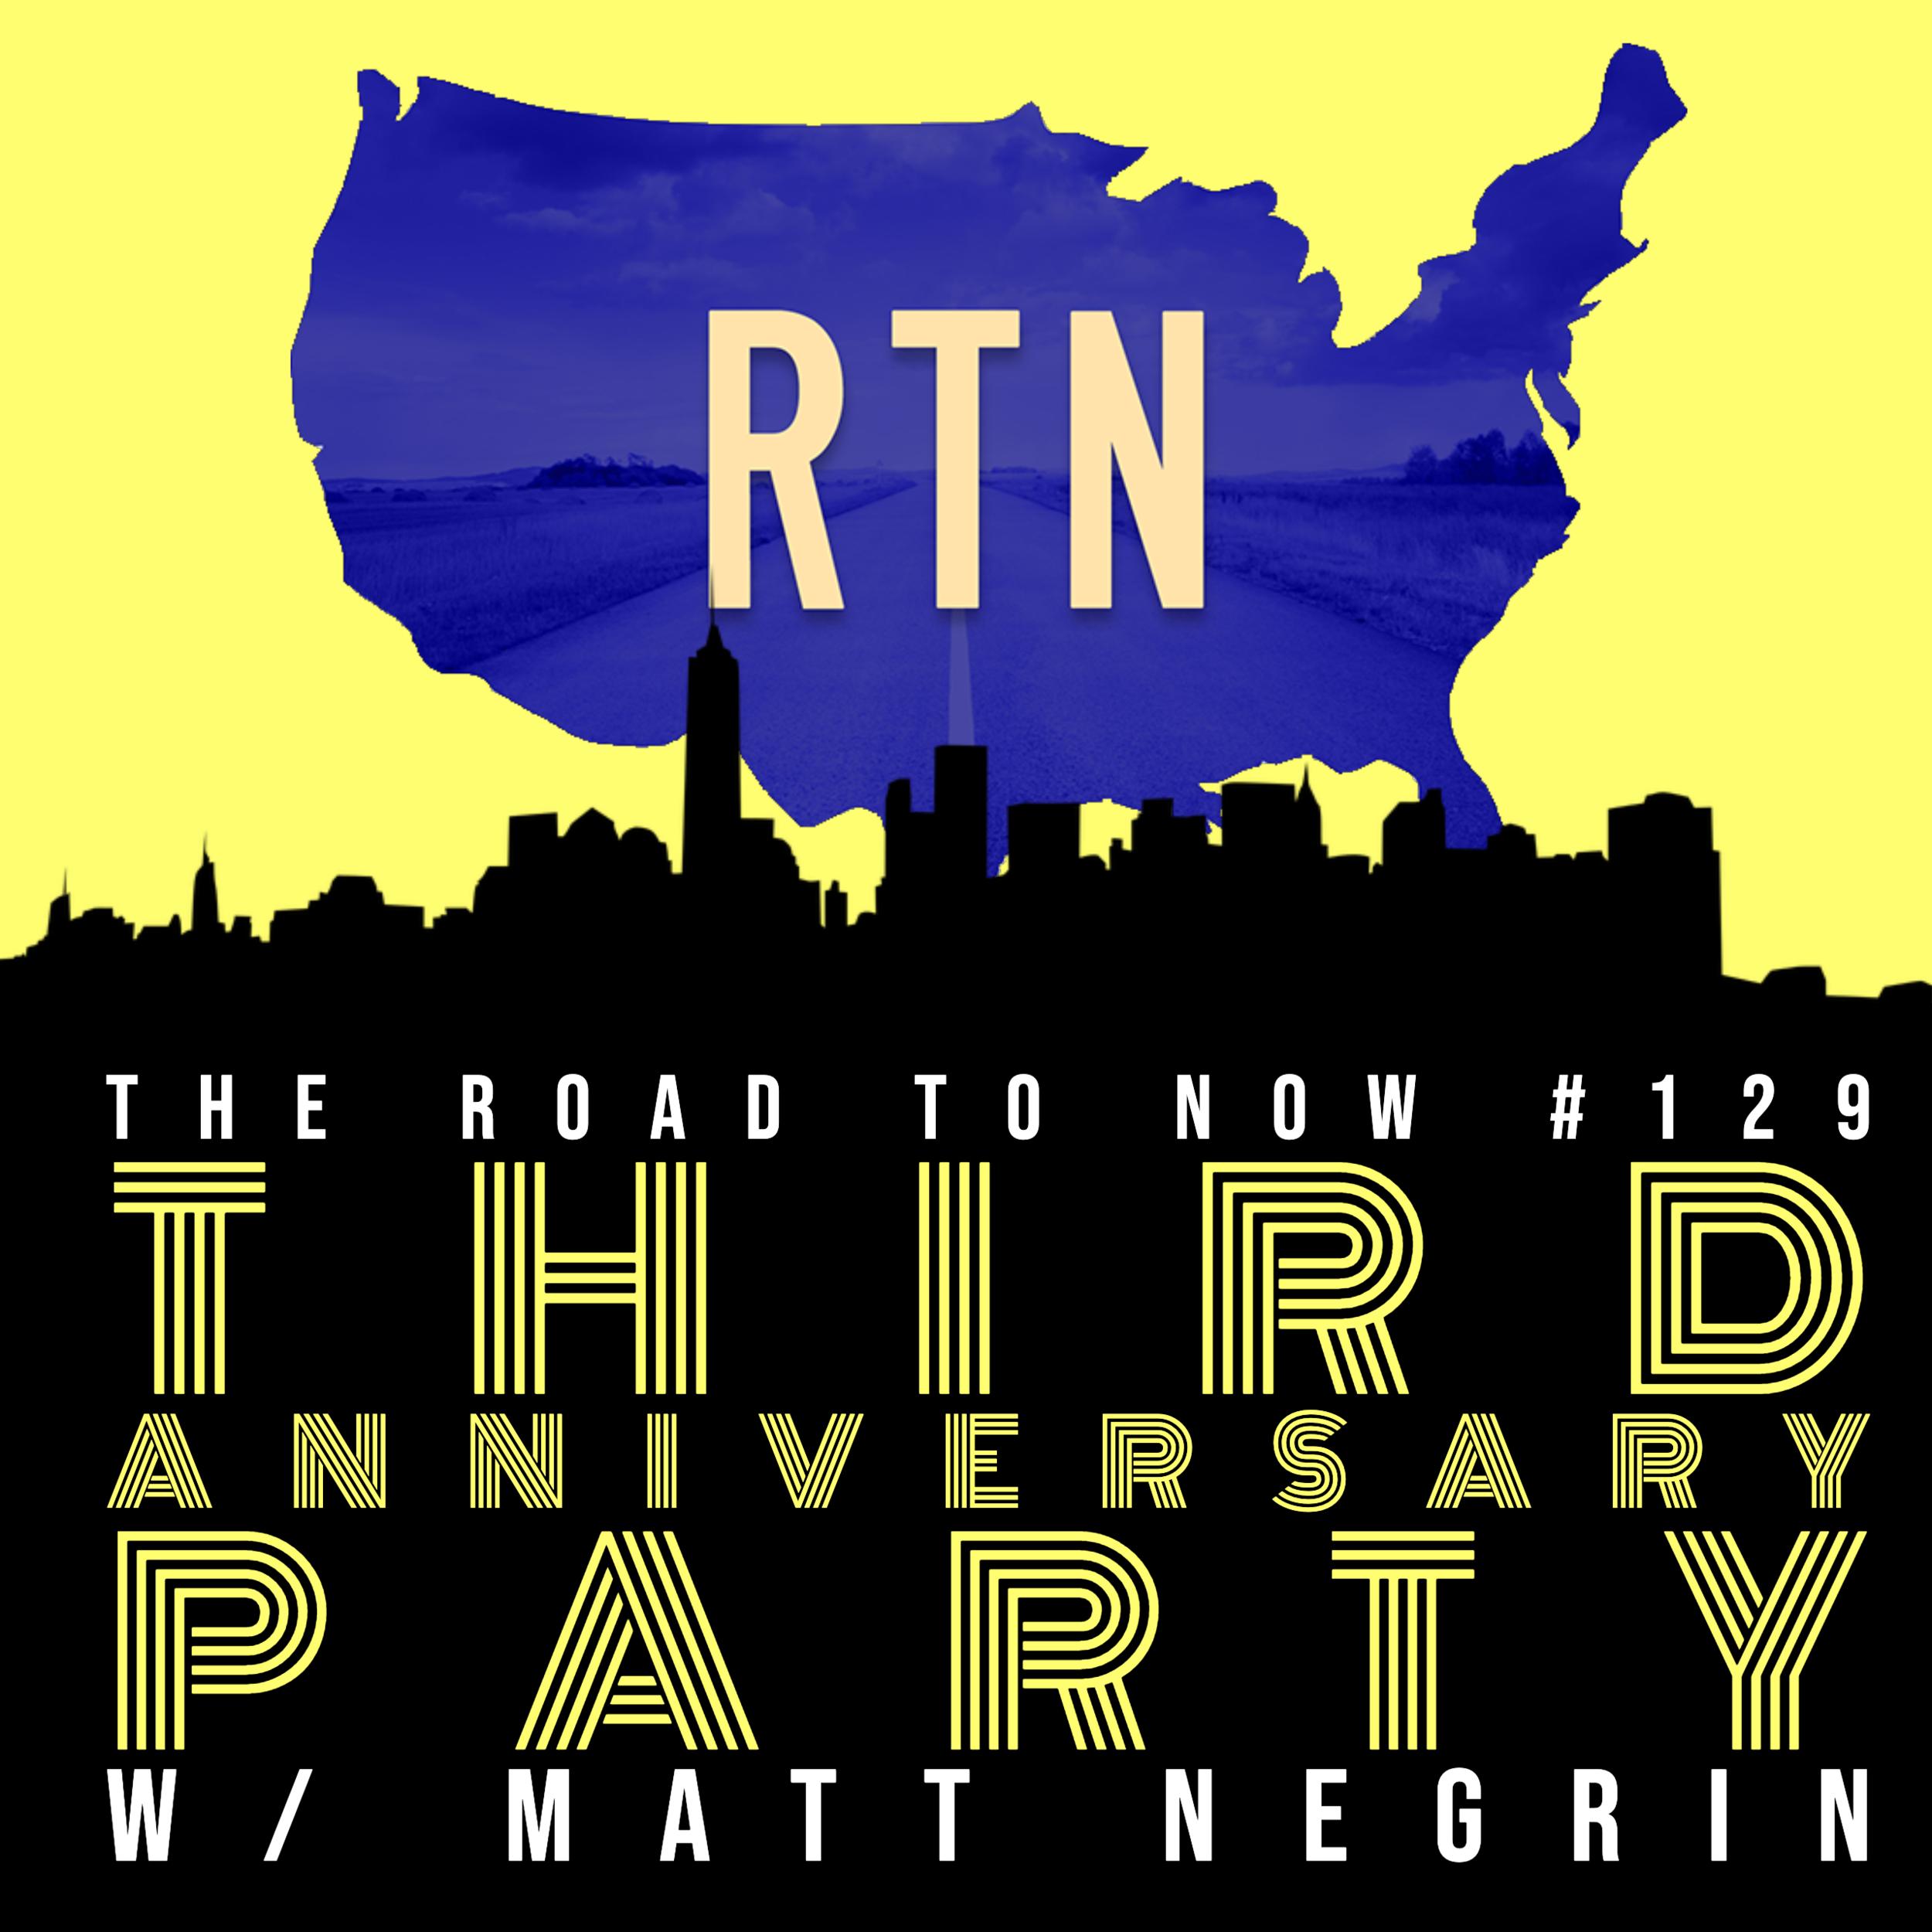 RTN Third Anniversary.png